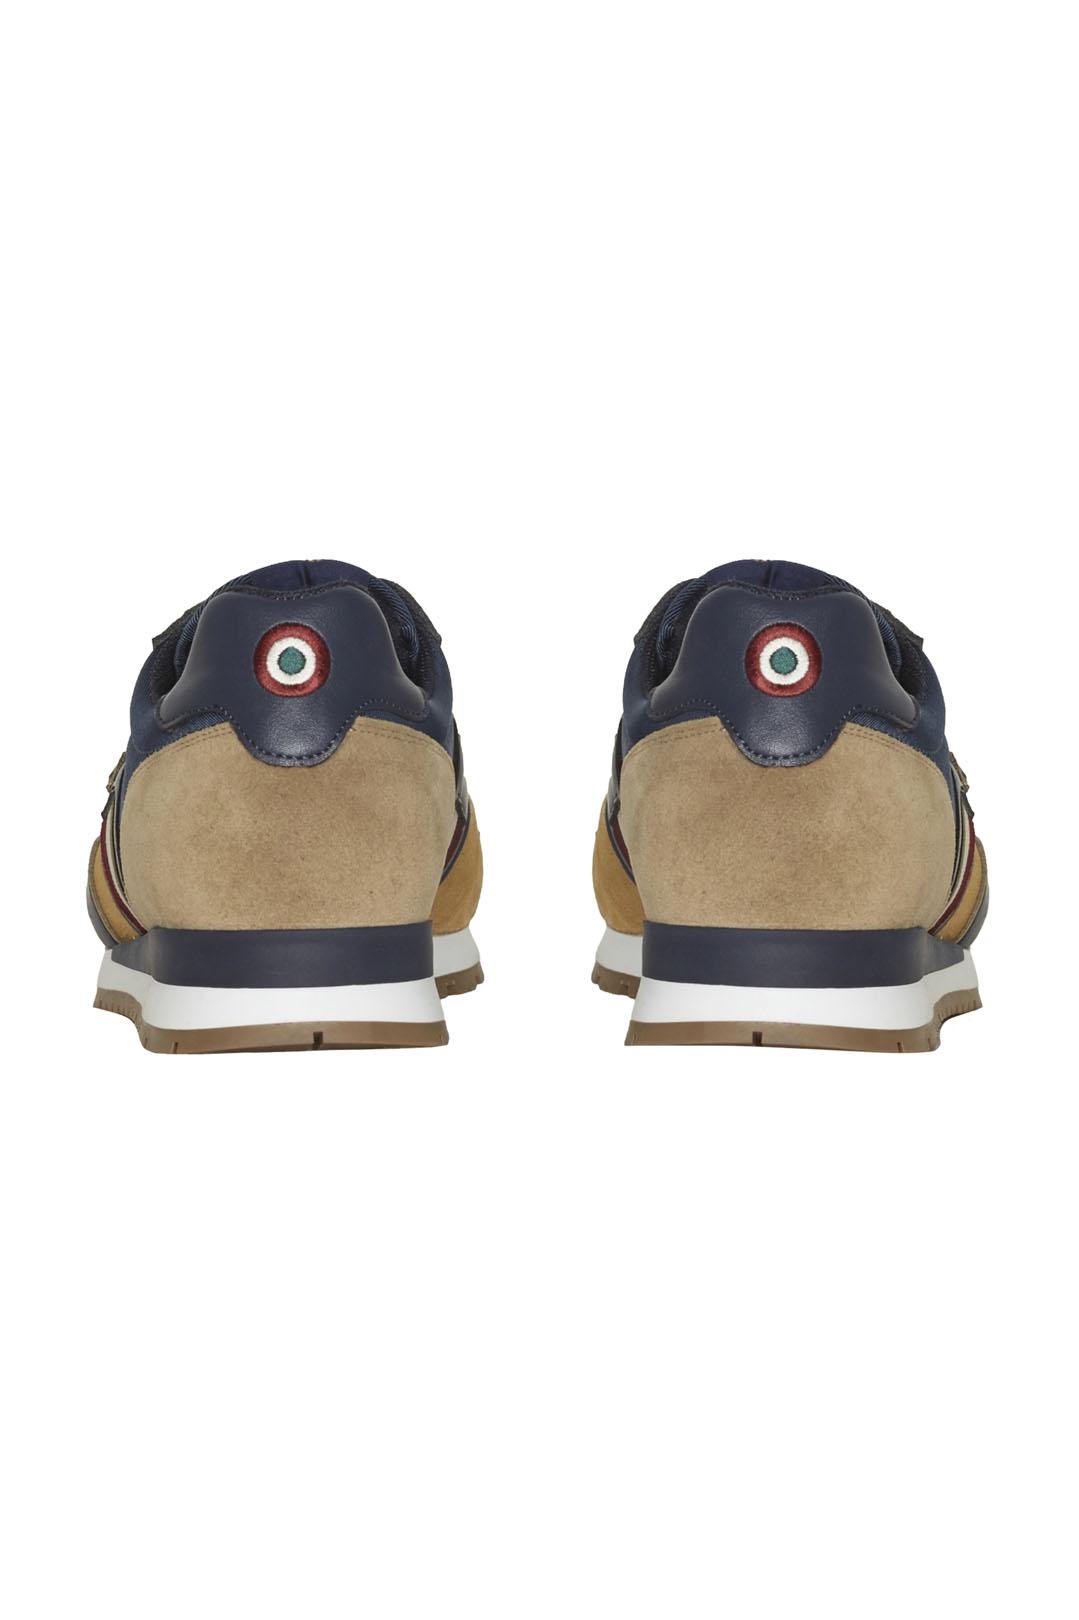 Sneakers mit Trikolor                    3